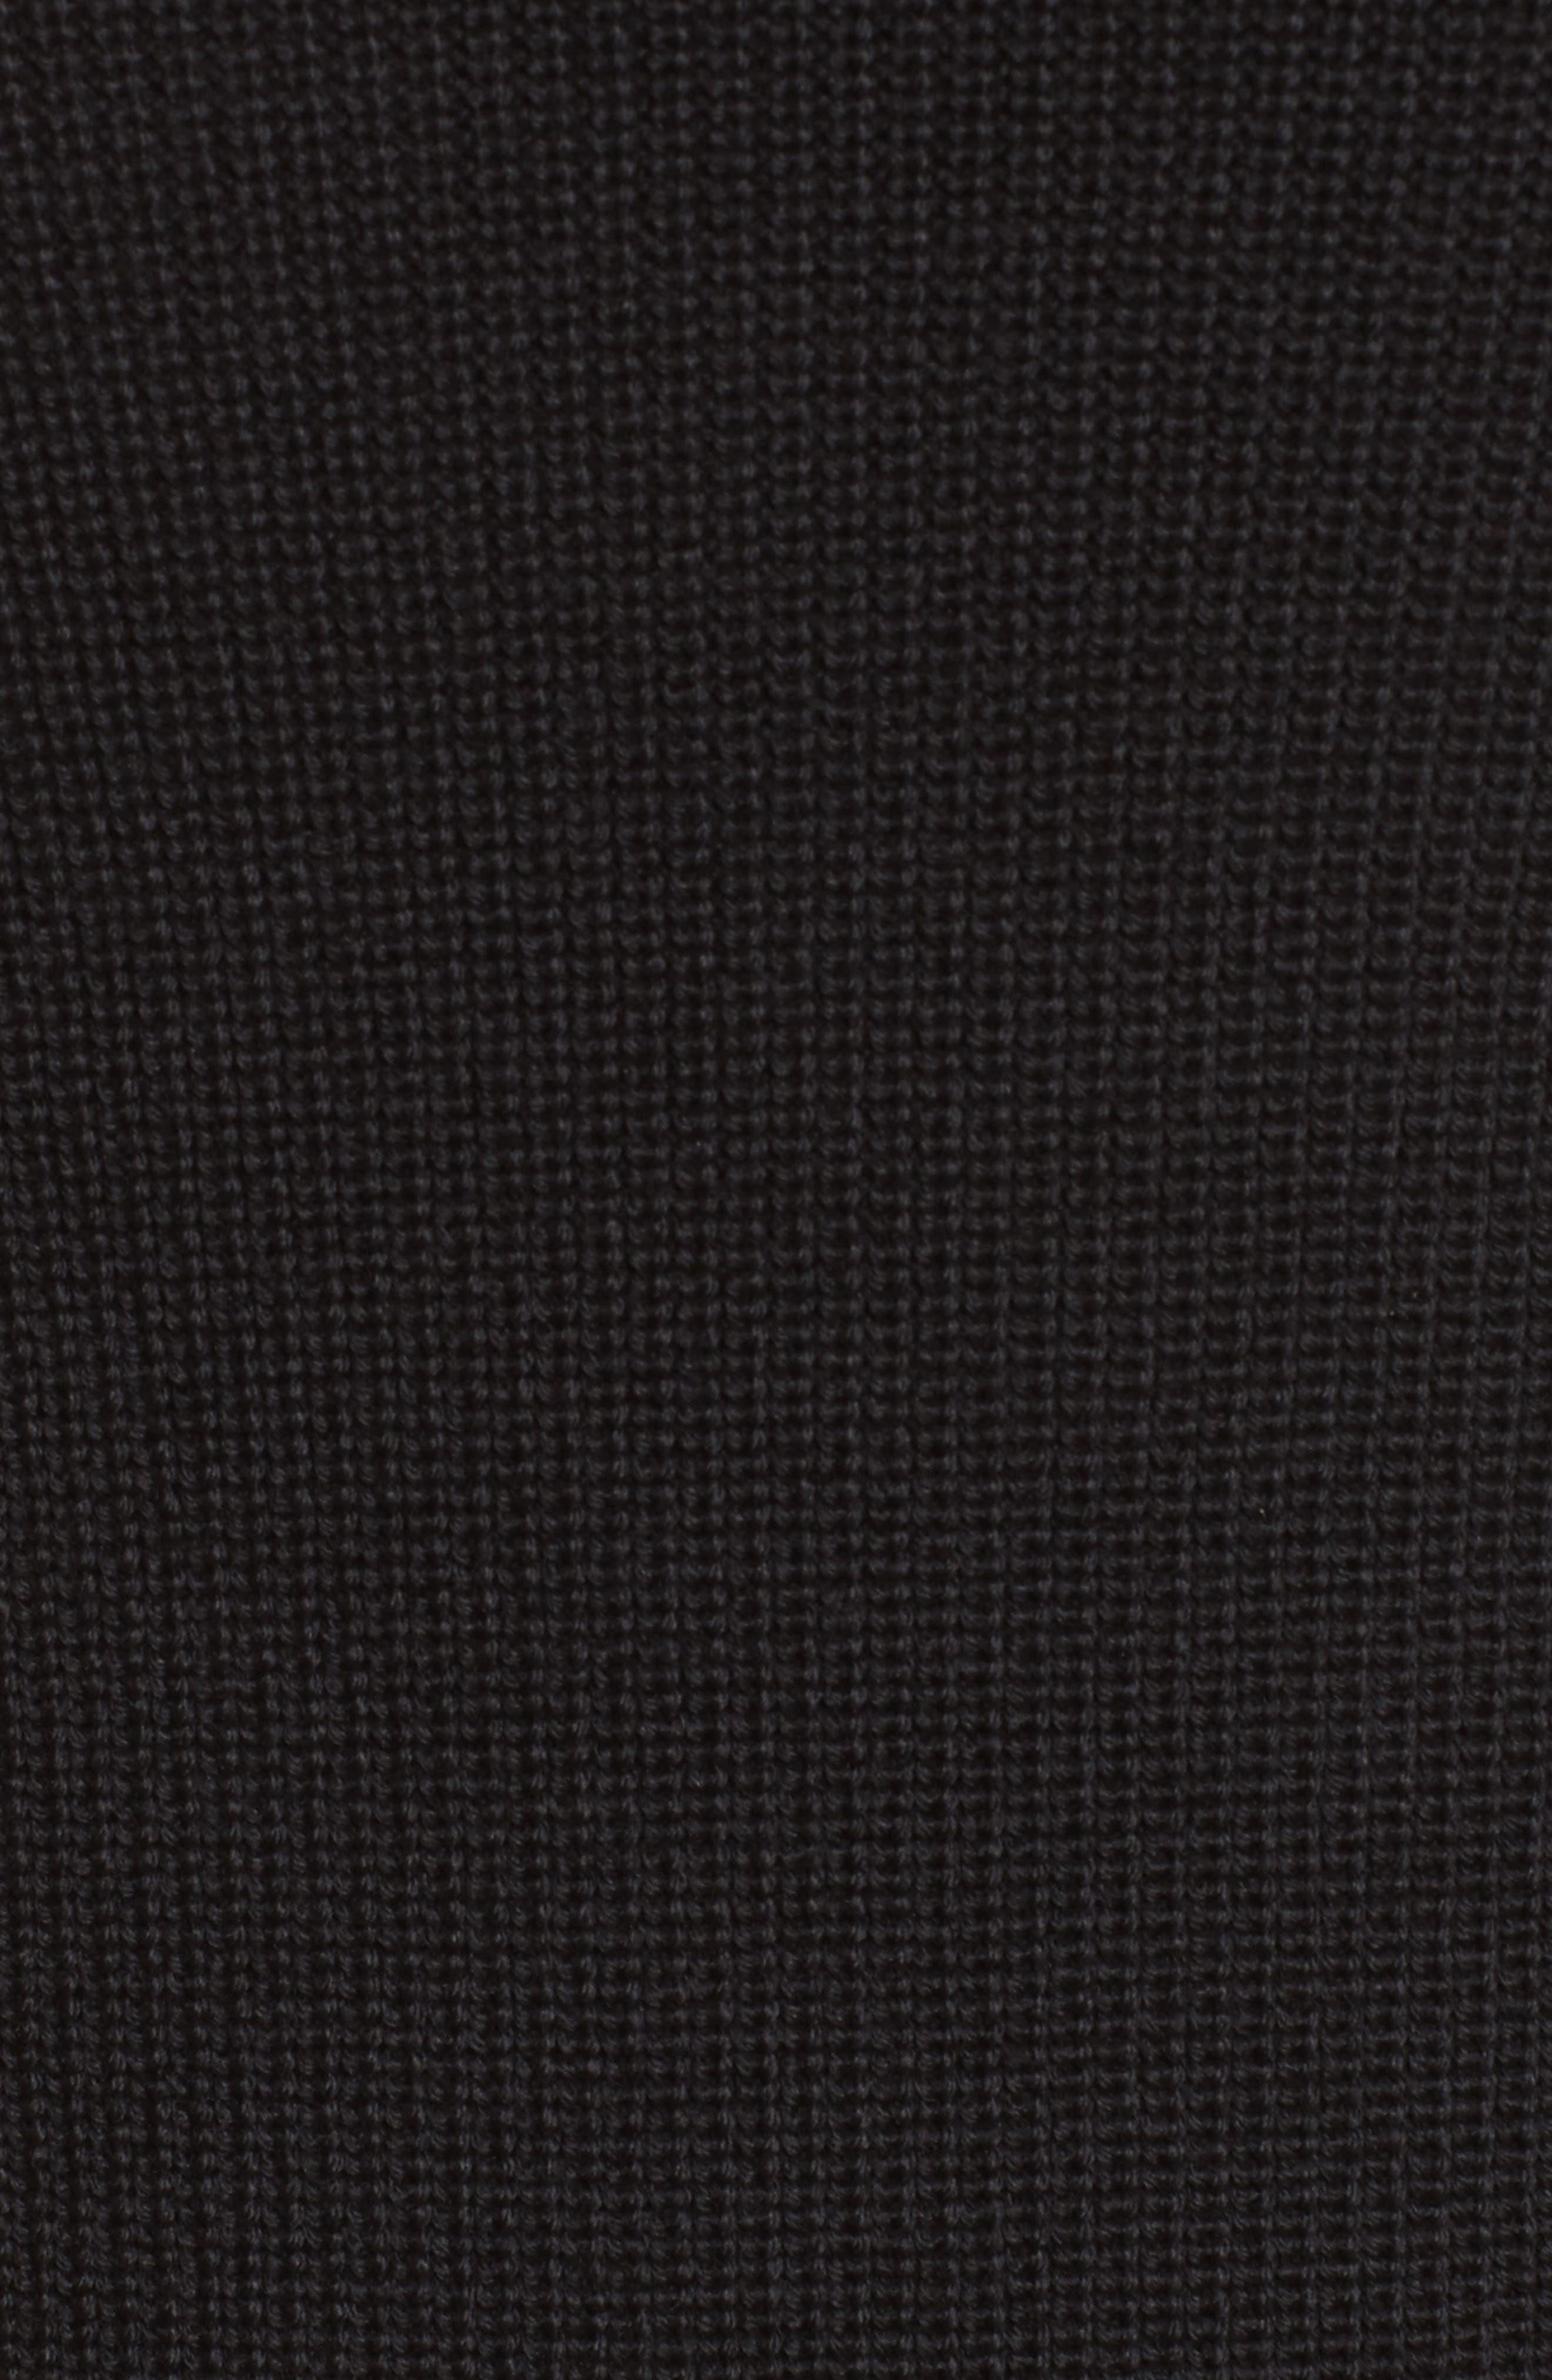 Virgin Wool Front Slit Tunic,                             Alternate thumbnail 5, color,                             001